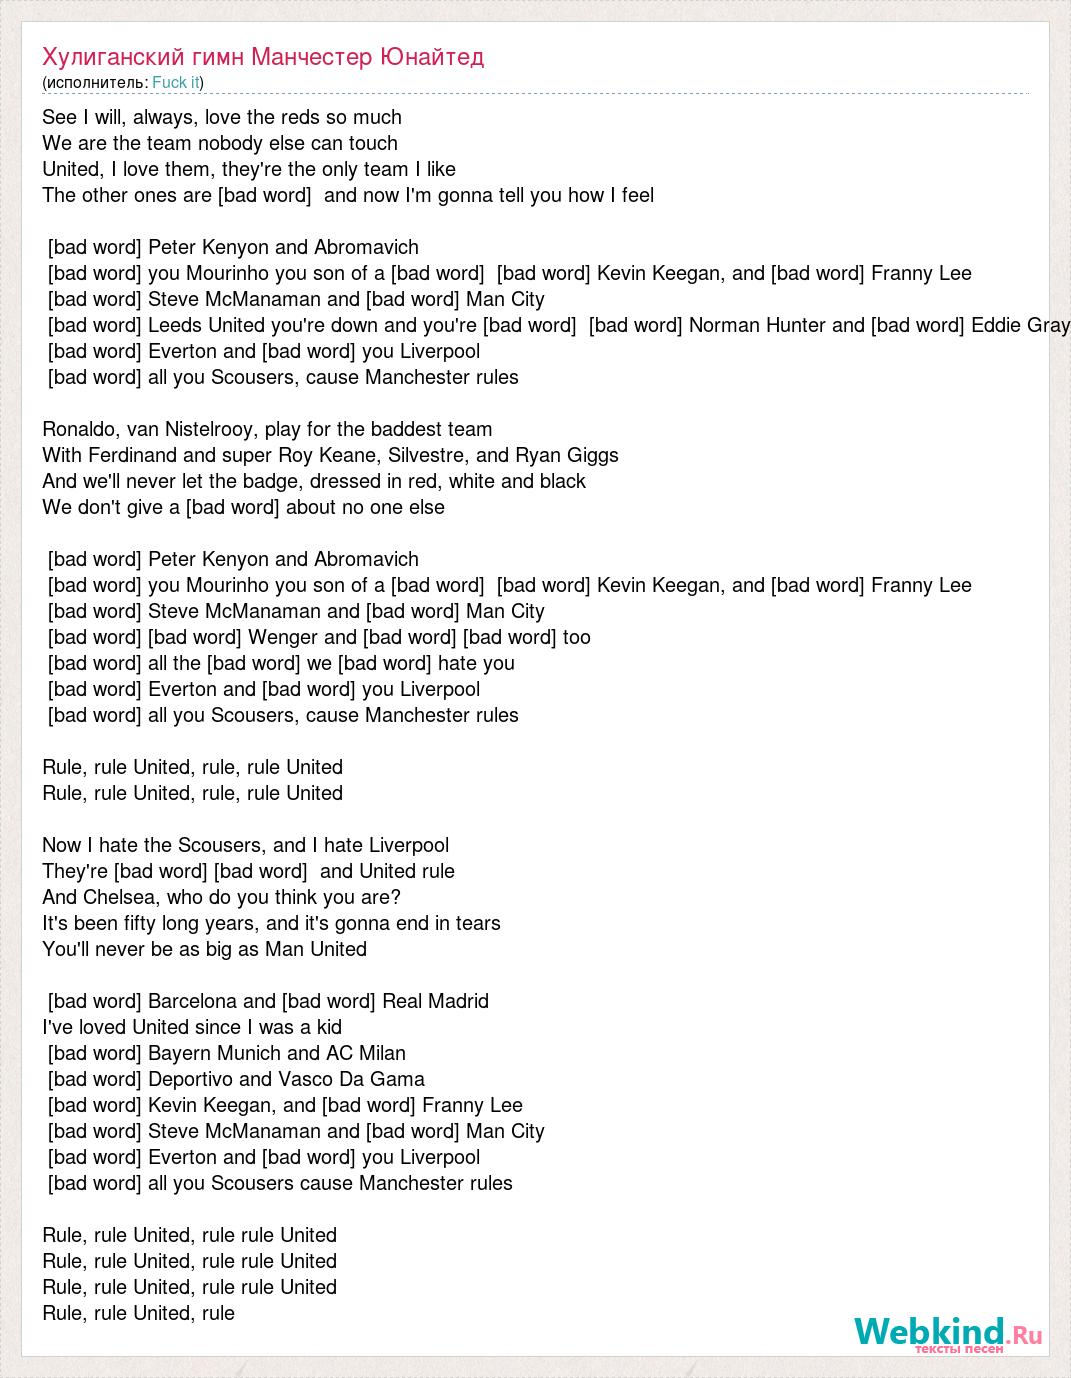 Манчестер юнайтед гимн текст